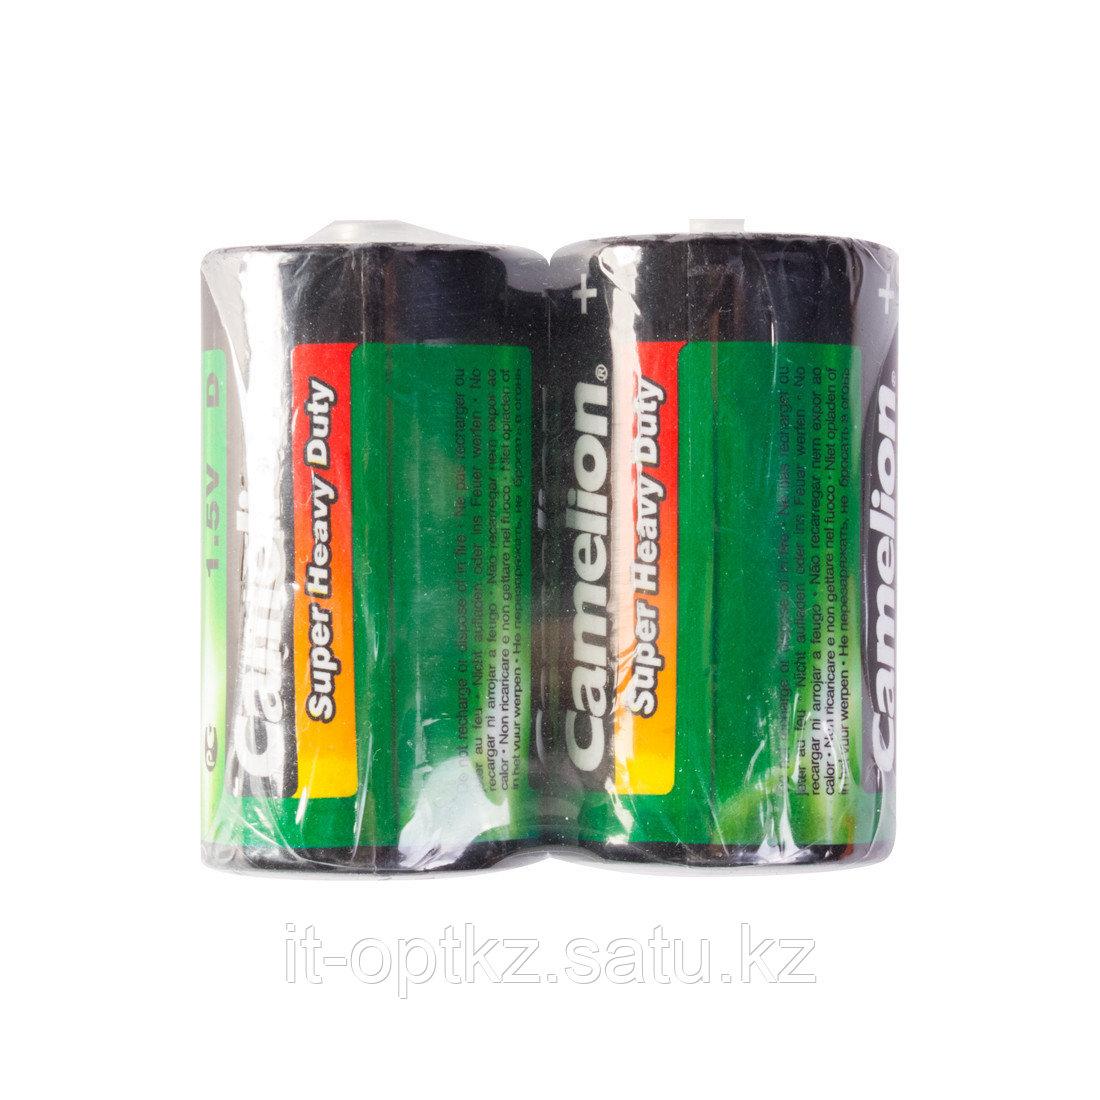 Батарейка CAMELION Super Heavy Duty R20P-SP2G